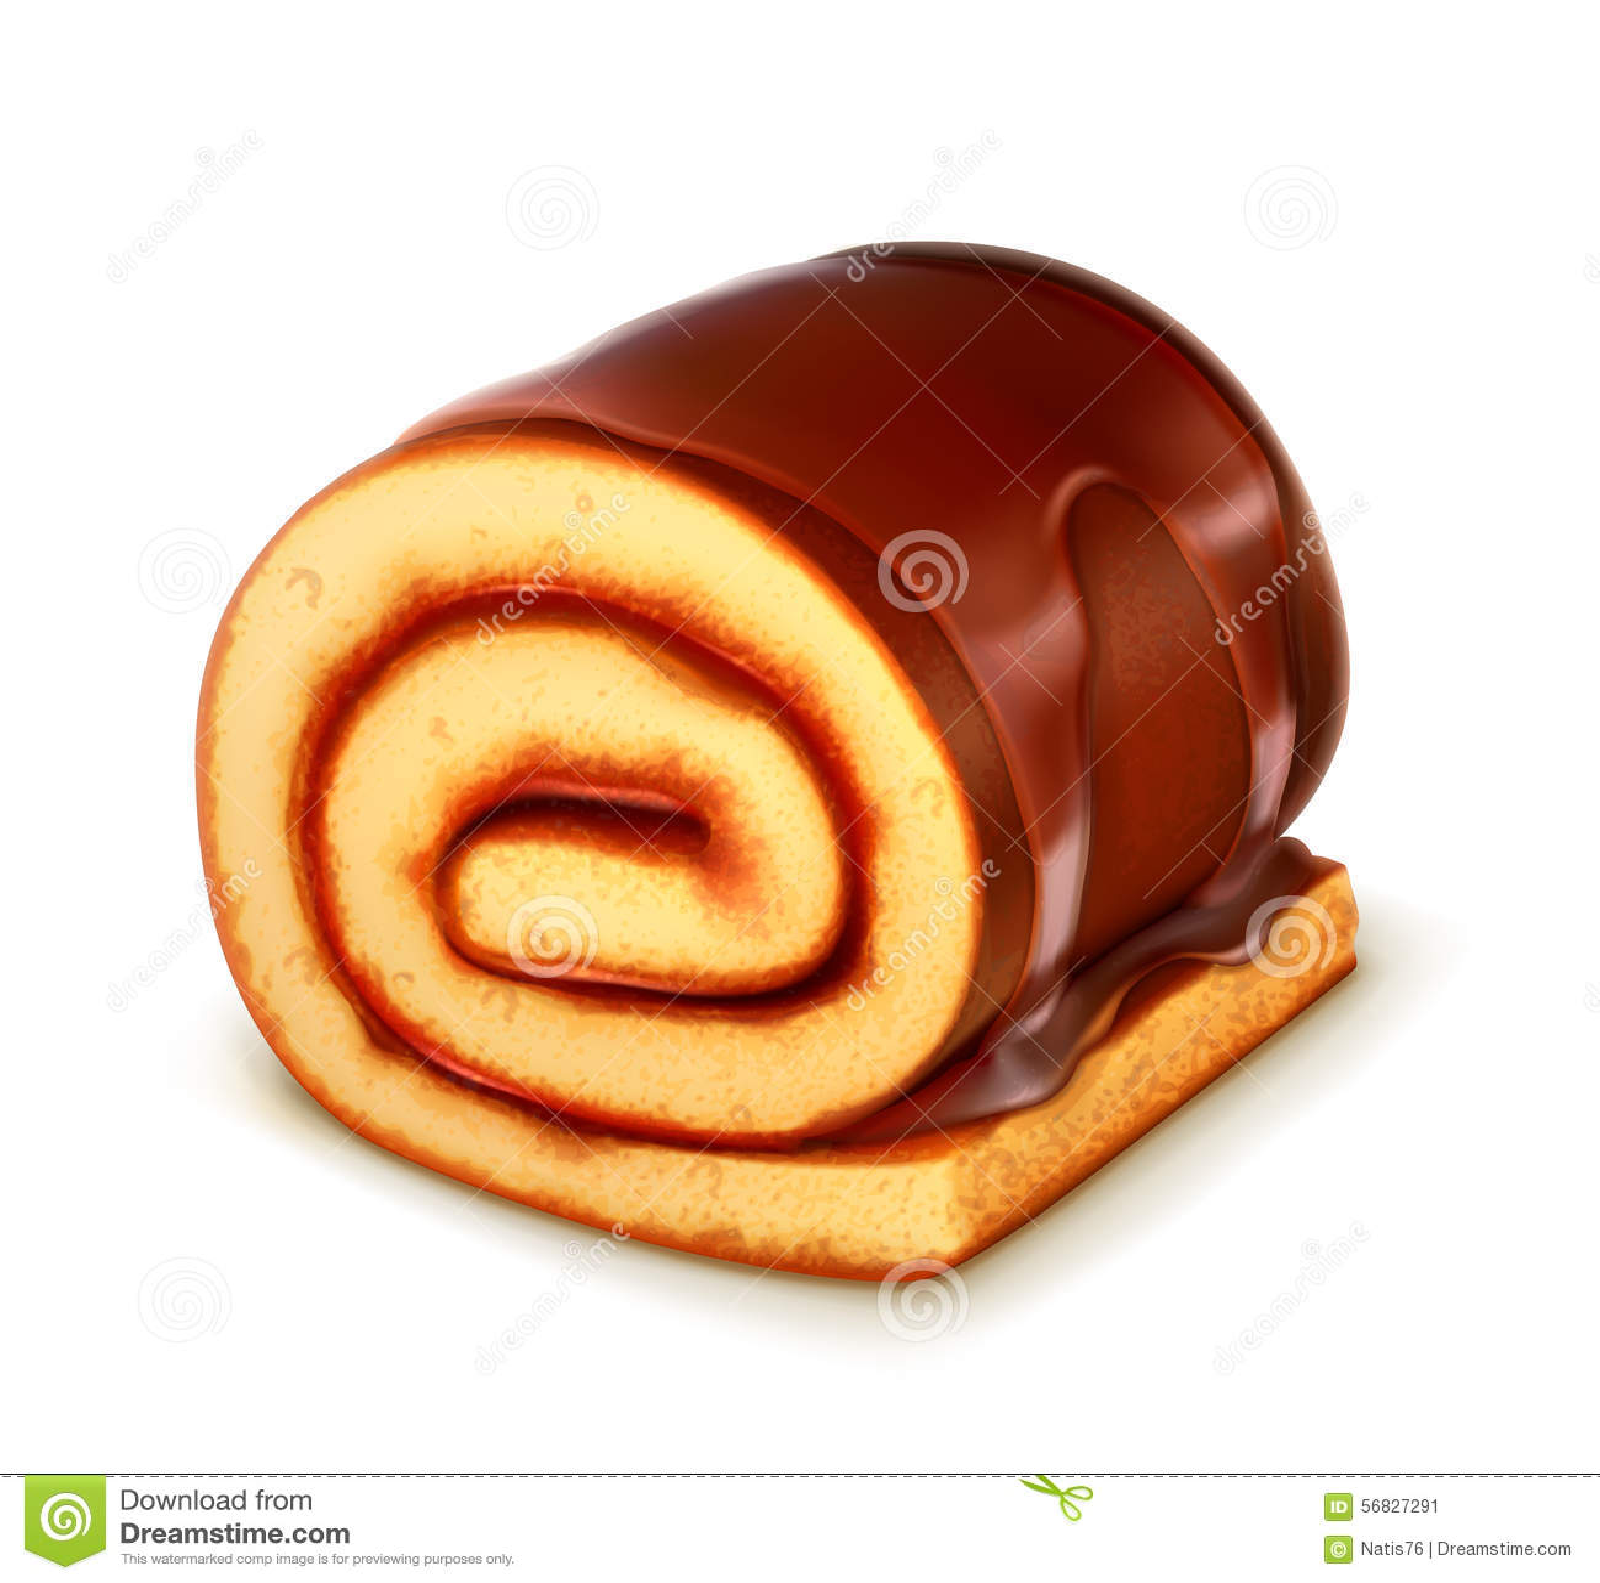 Chocolate Roll Cake Stock Vector - Image: 56827291